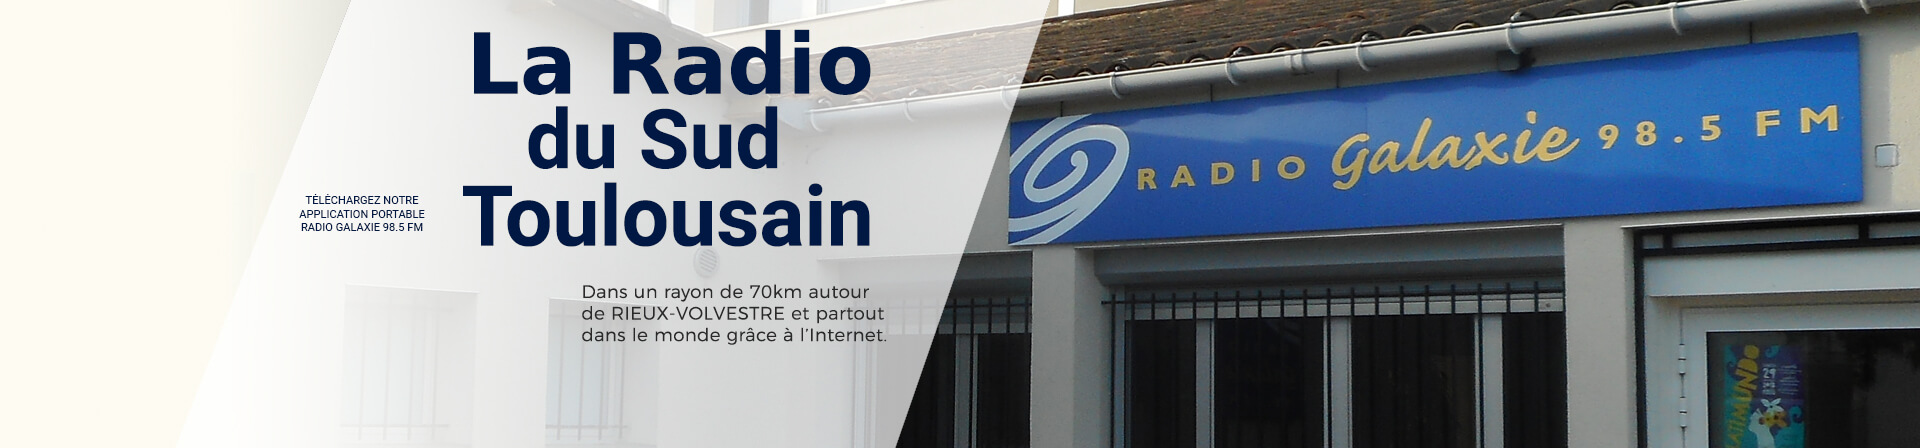 Radio Galaxie 98.5 FM - Home Slider 2